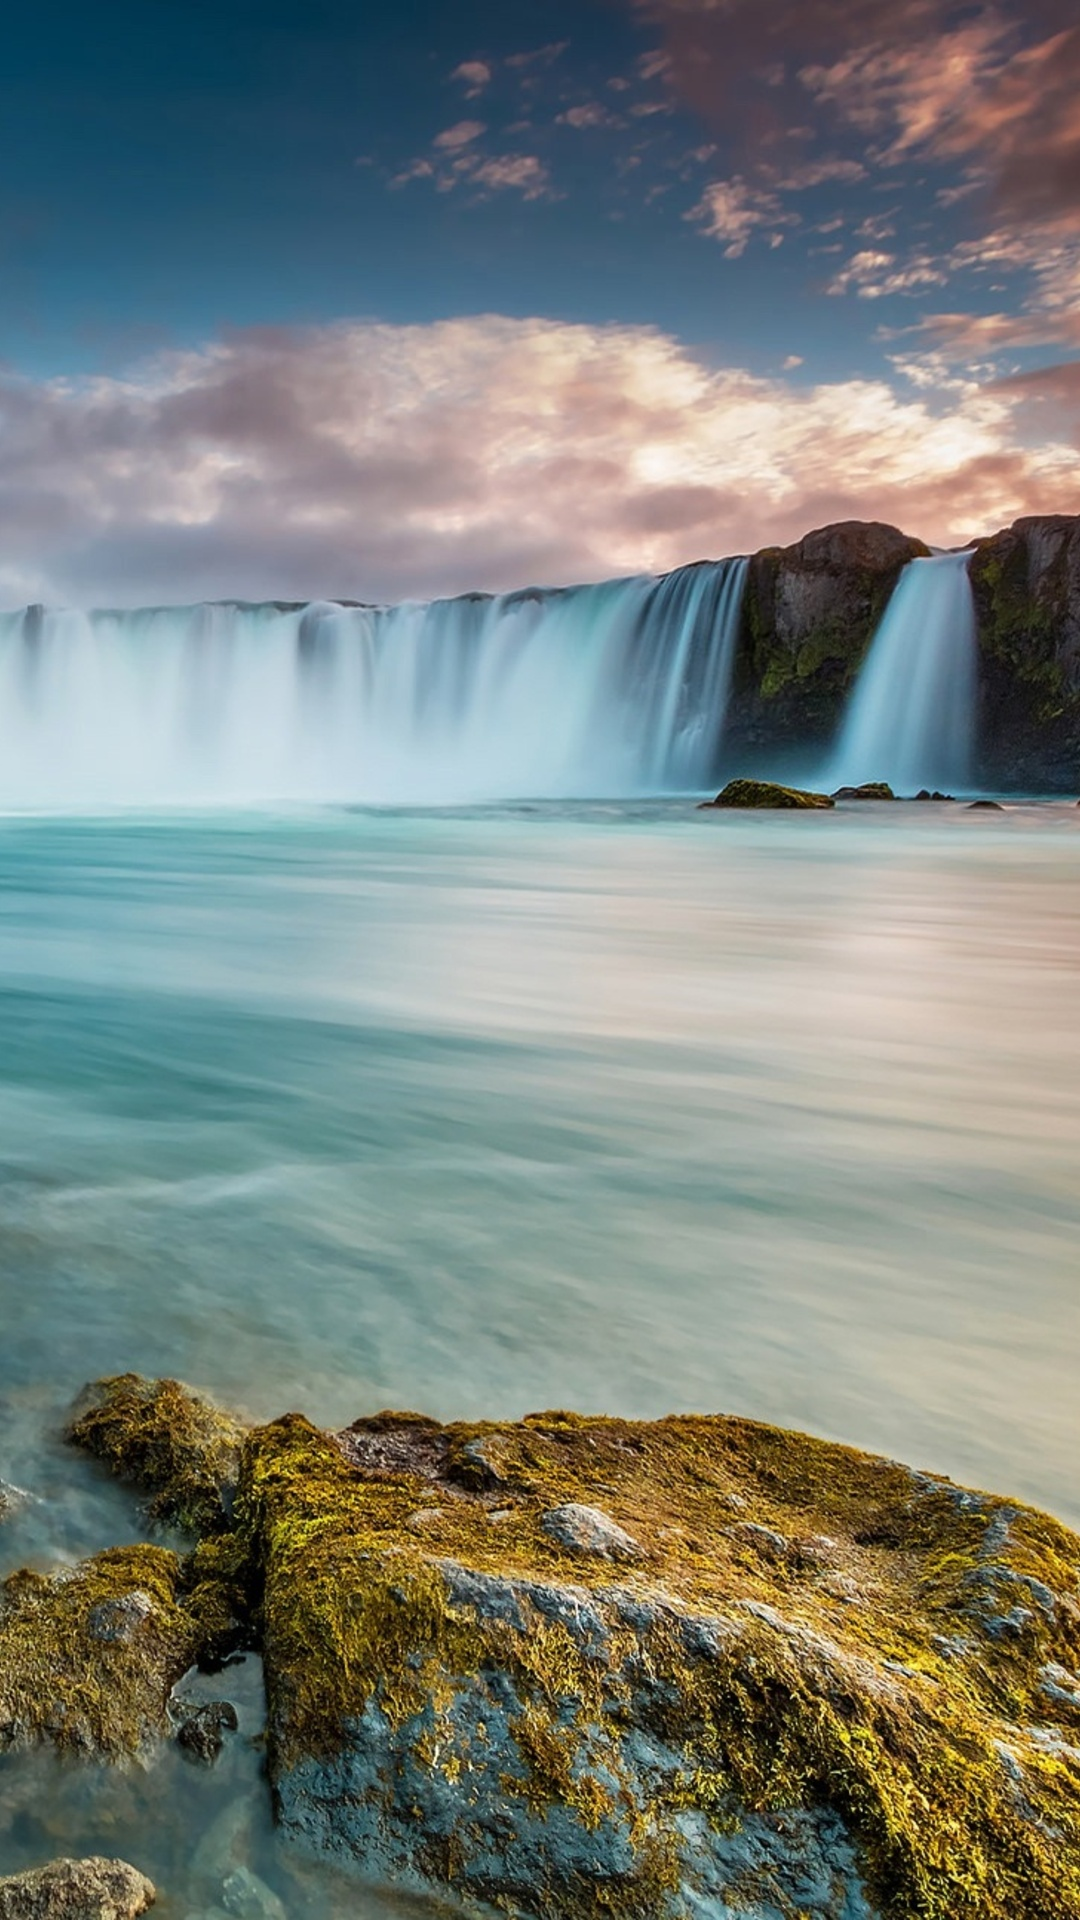 nature-river-rock-waterfall-dz.jpg